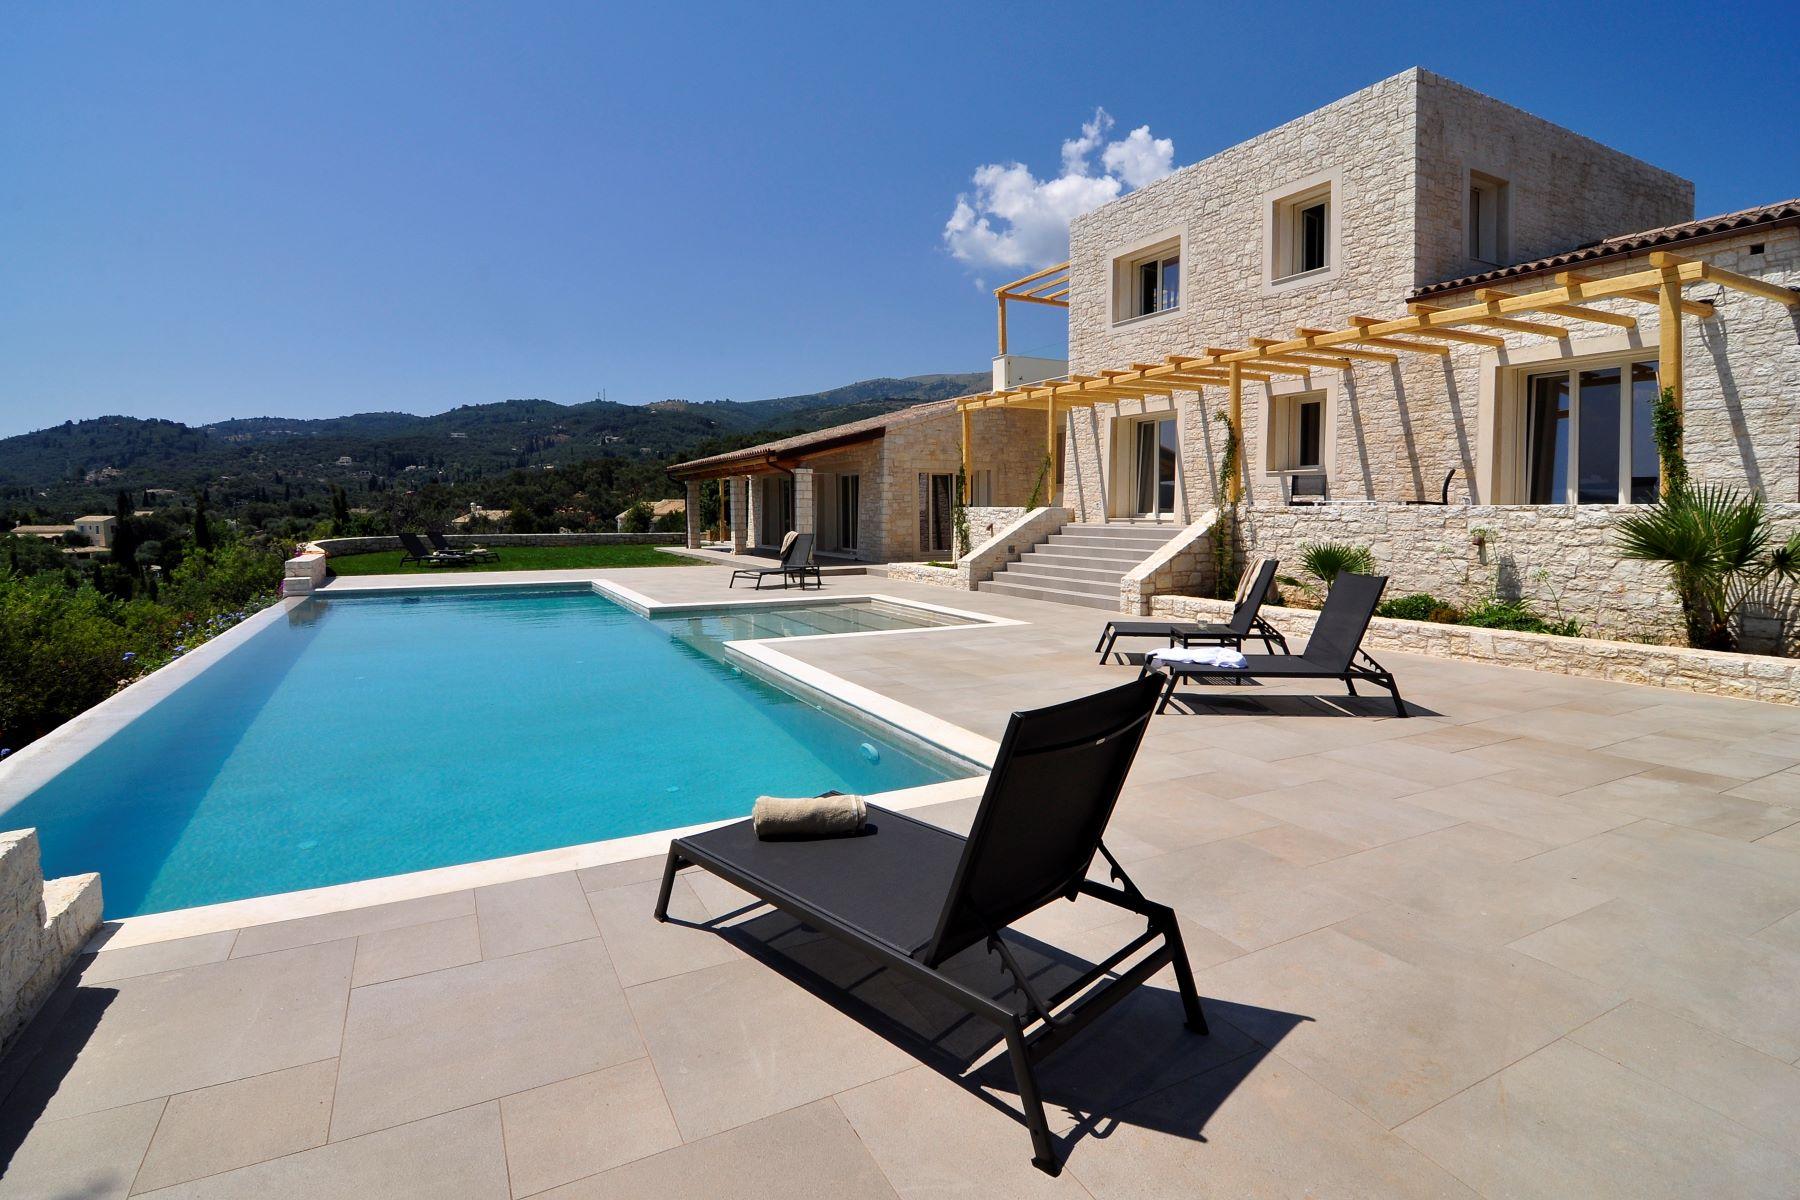 Single Family Home for Sale at Azzurro Corfu, Ionian Islands, Greece